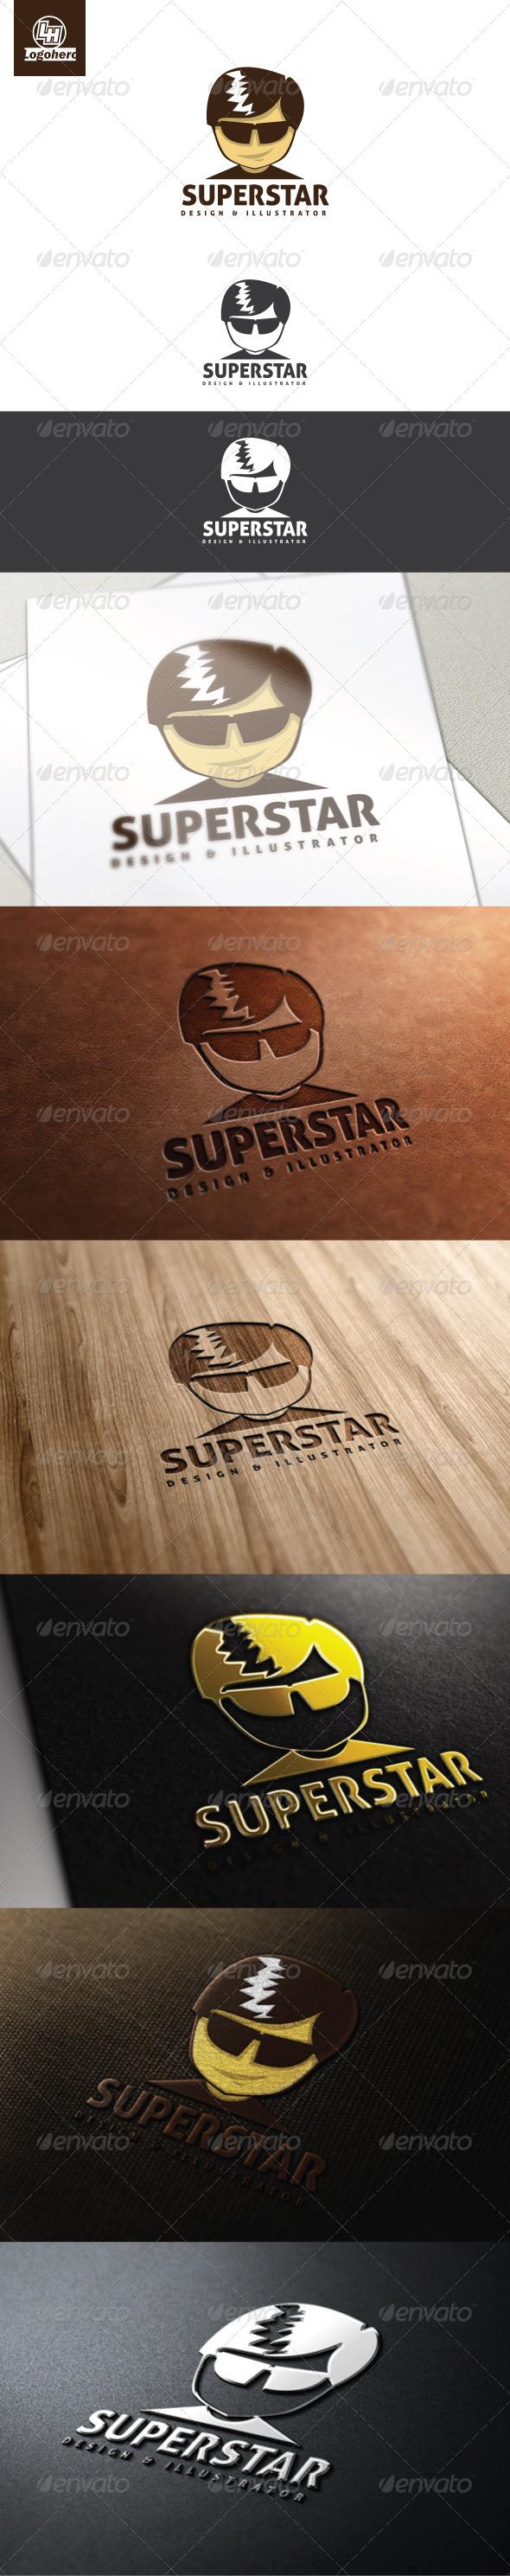 GraphicRiver Superstar Logo Template 4468849